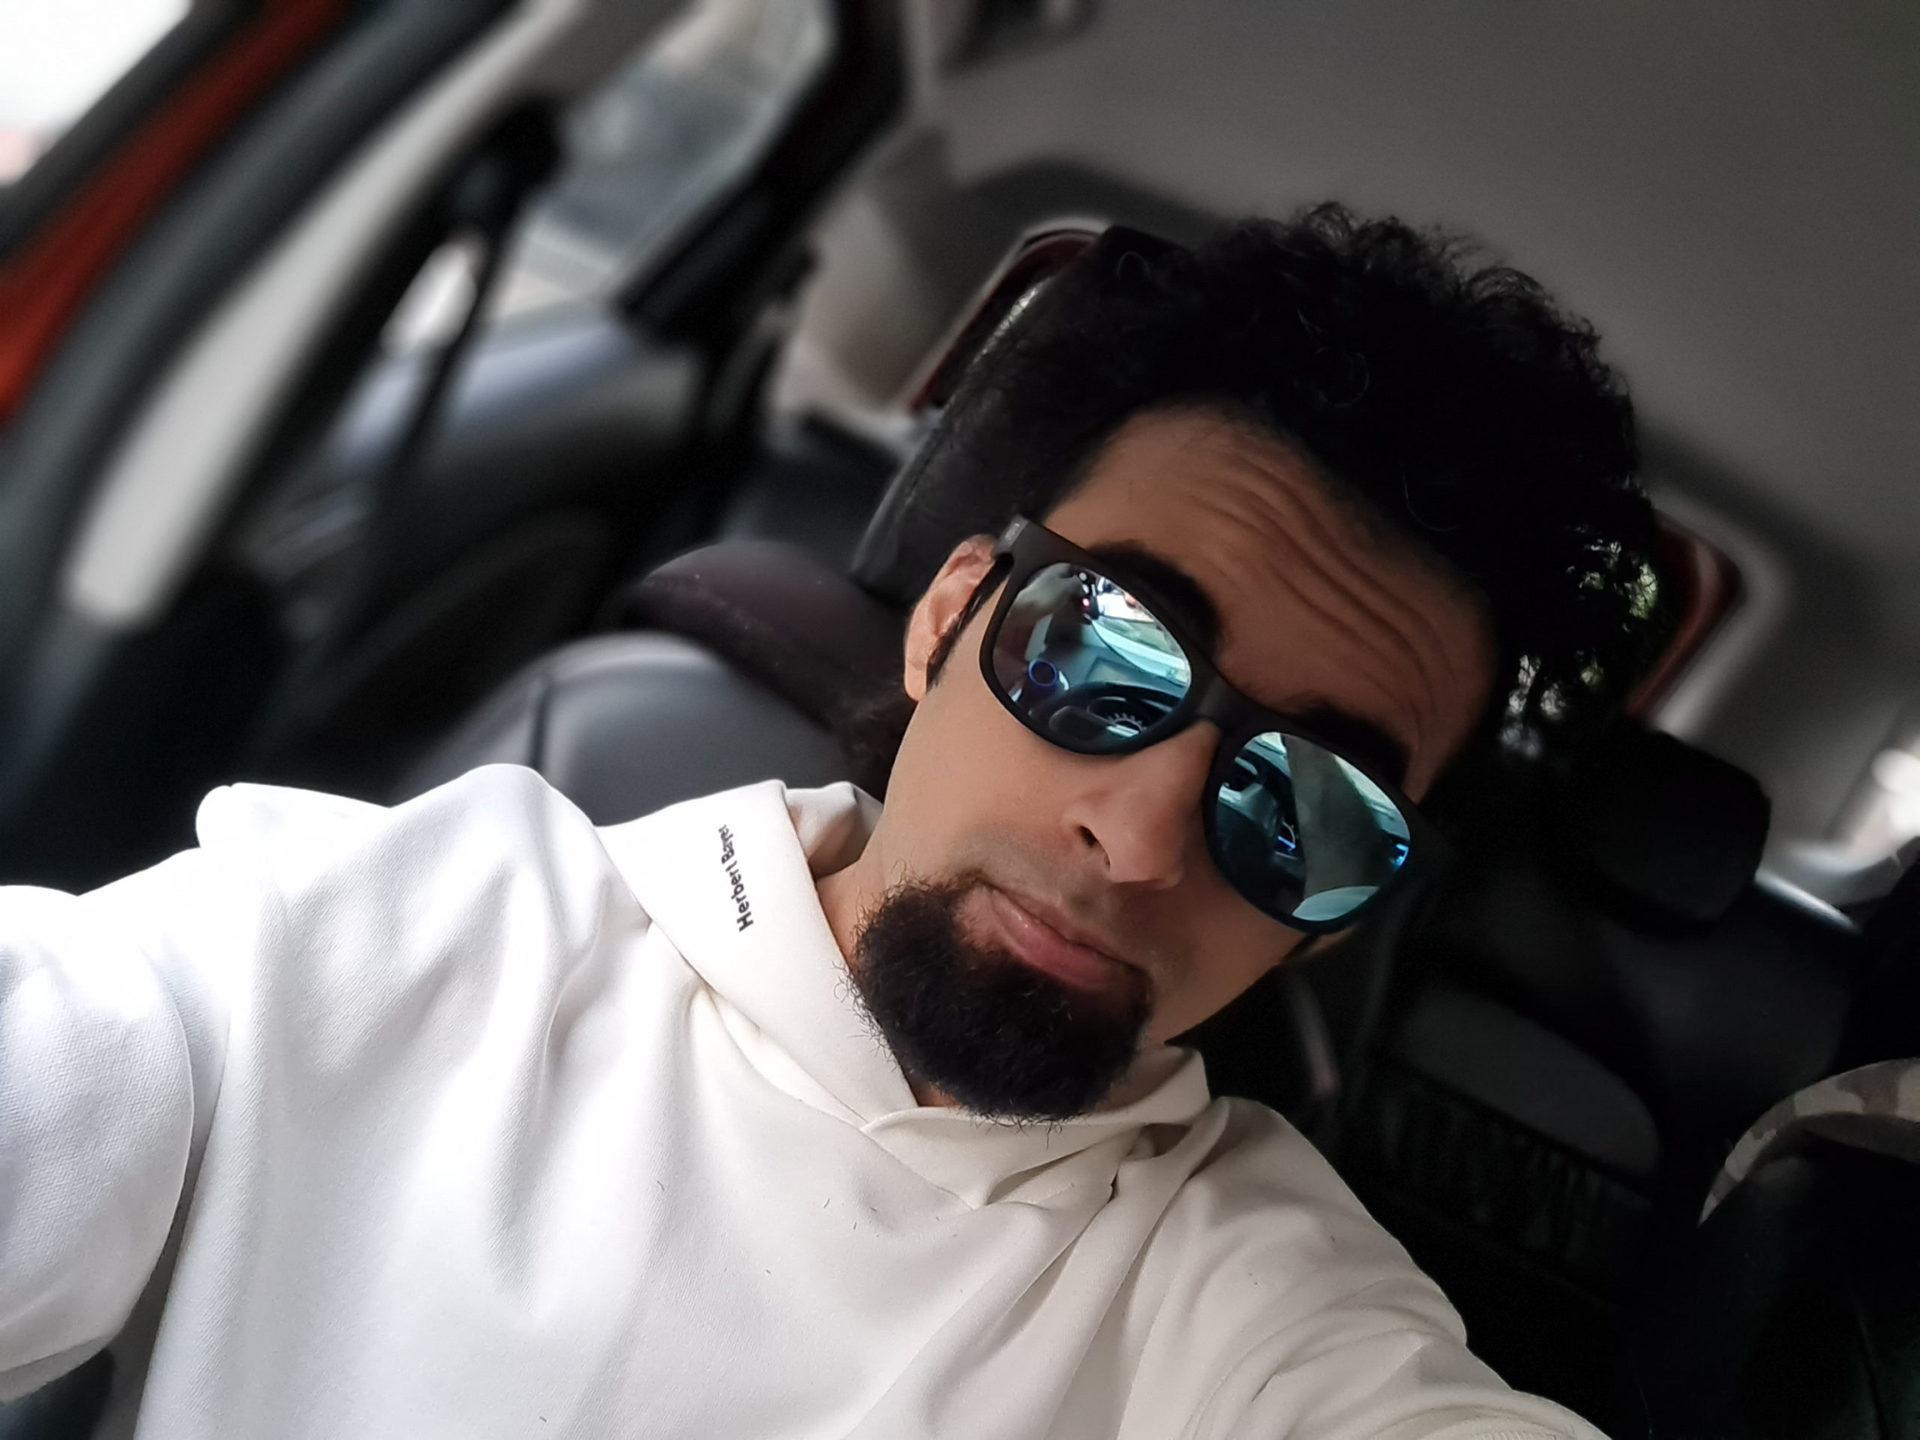 Samsung Galaxy S20 FE selfie portrait